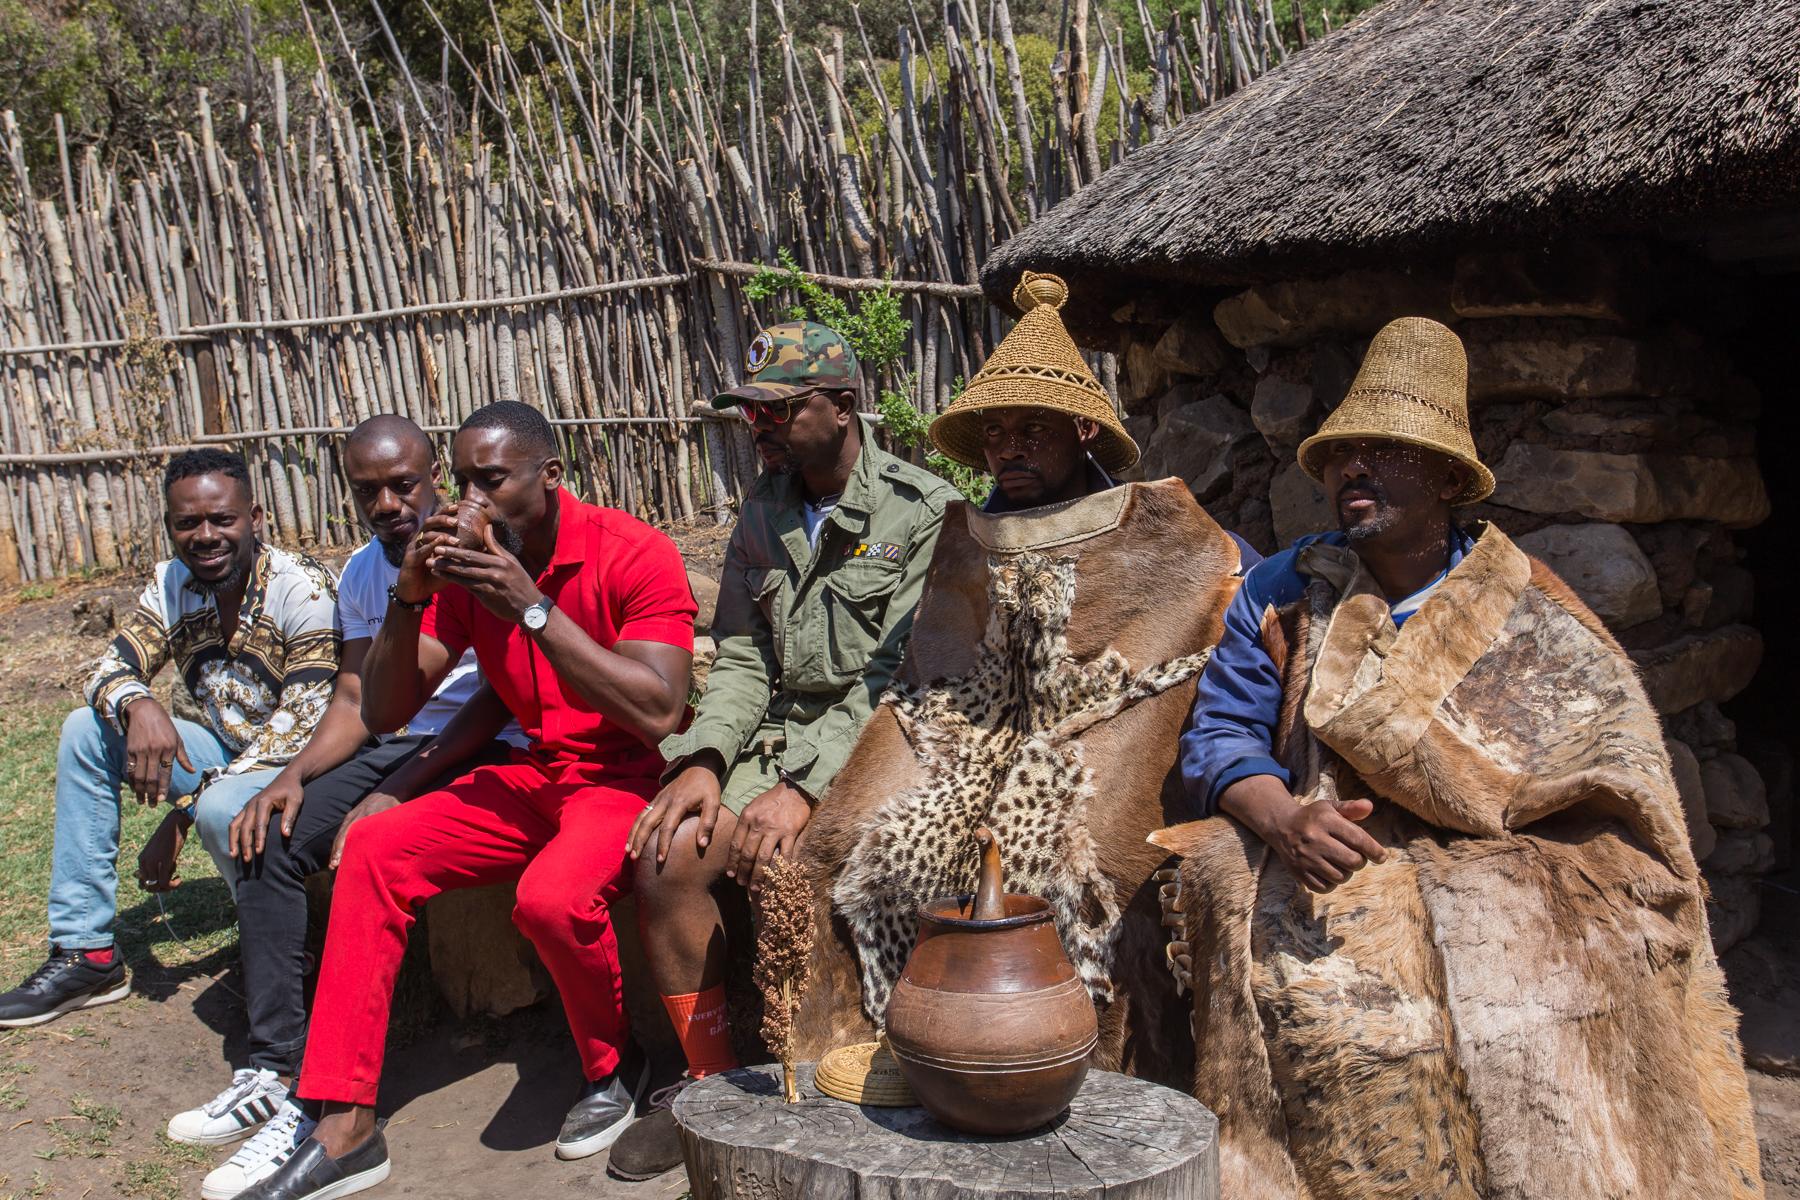 Drinking Local Wine at Basotho Cultural Village